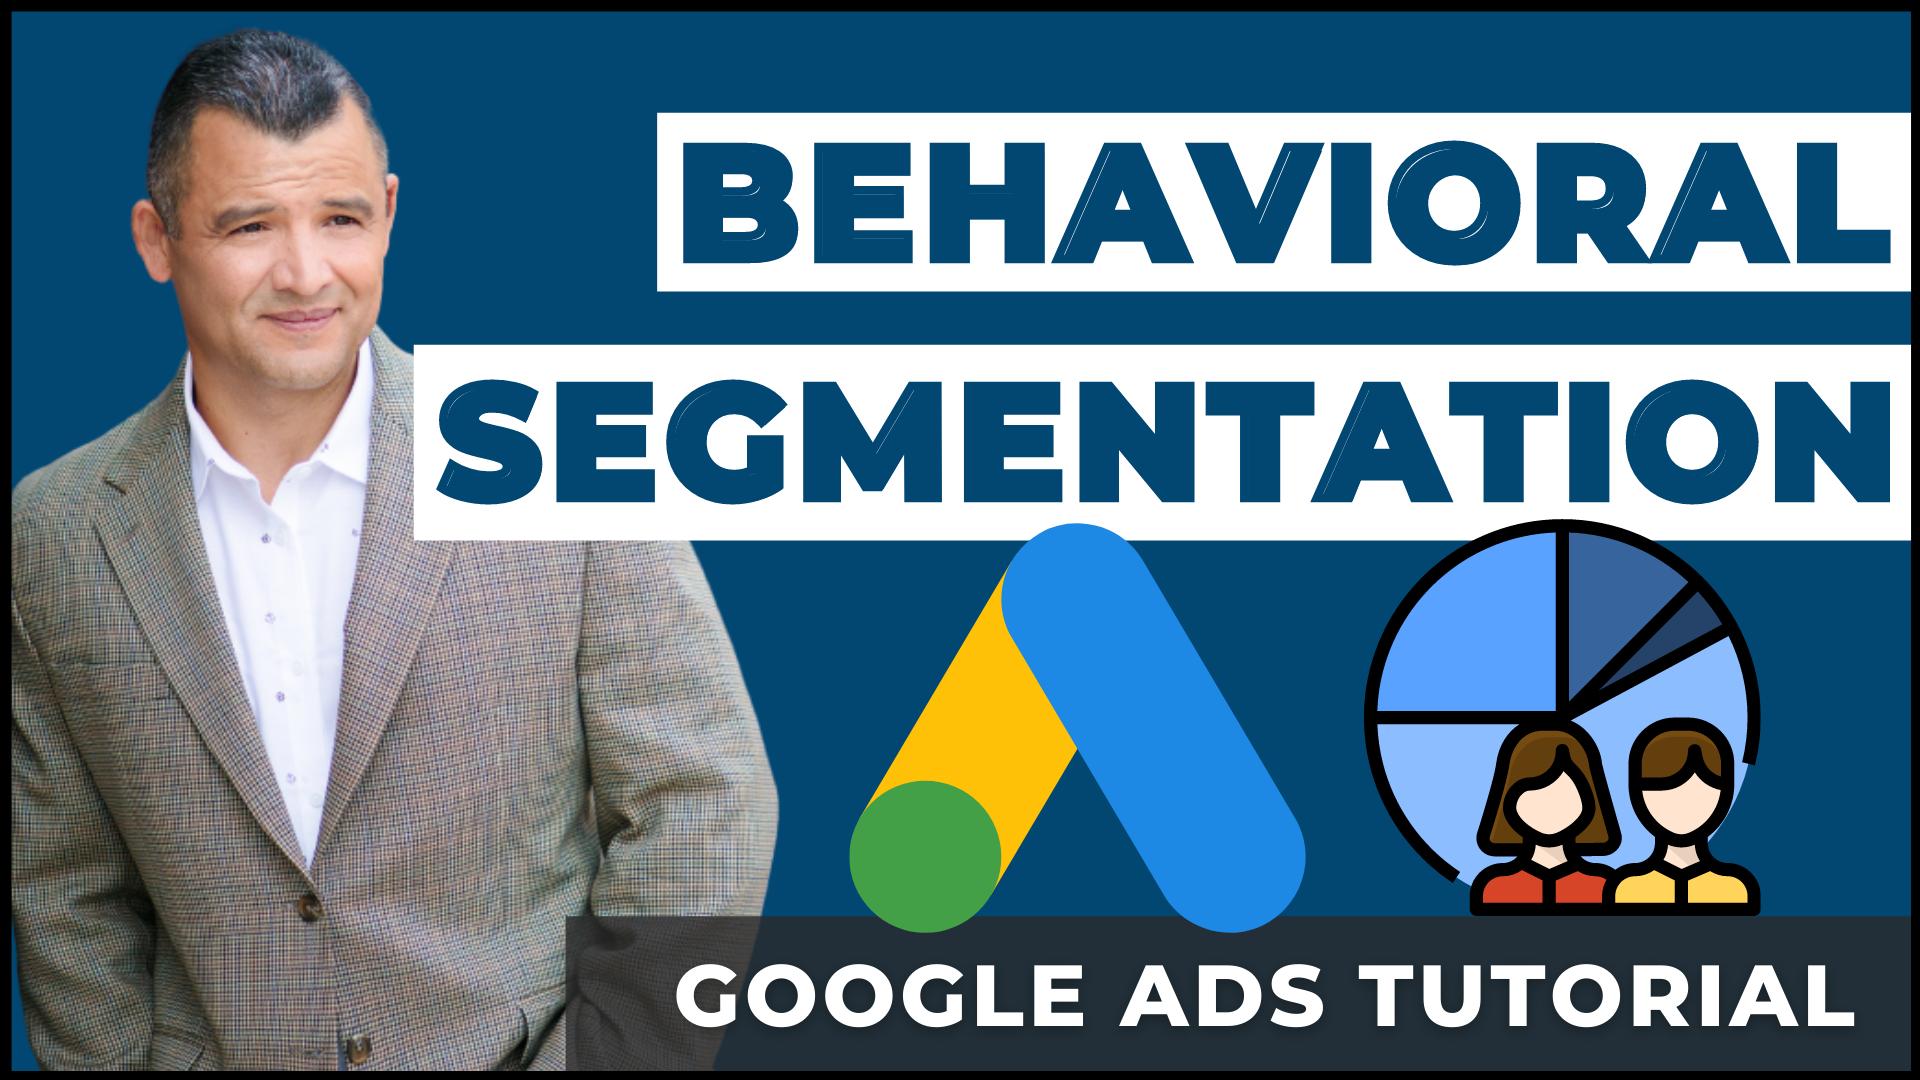 How To use Behavioral Segmentation in Google Ads